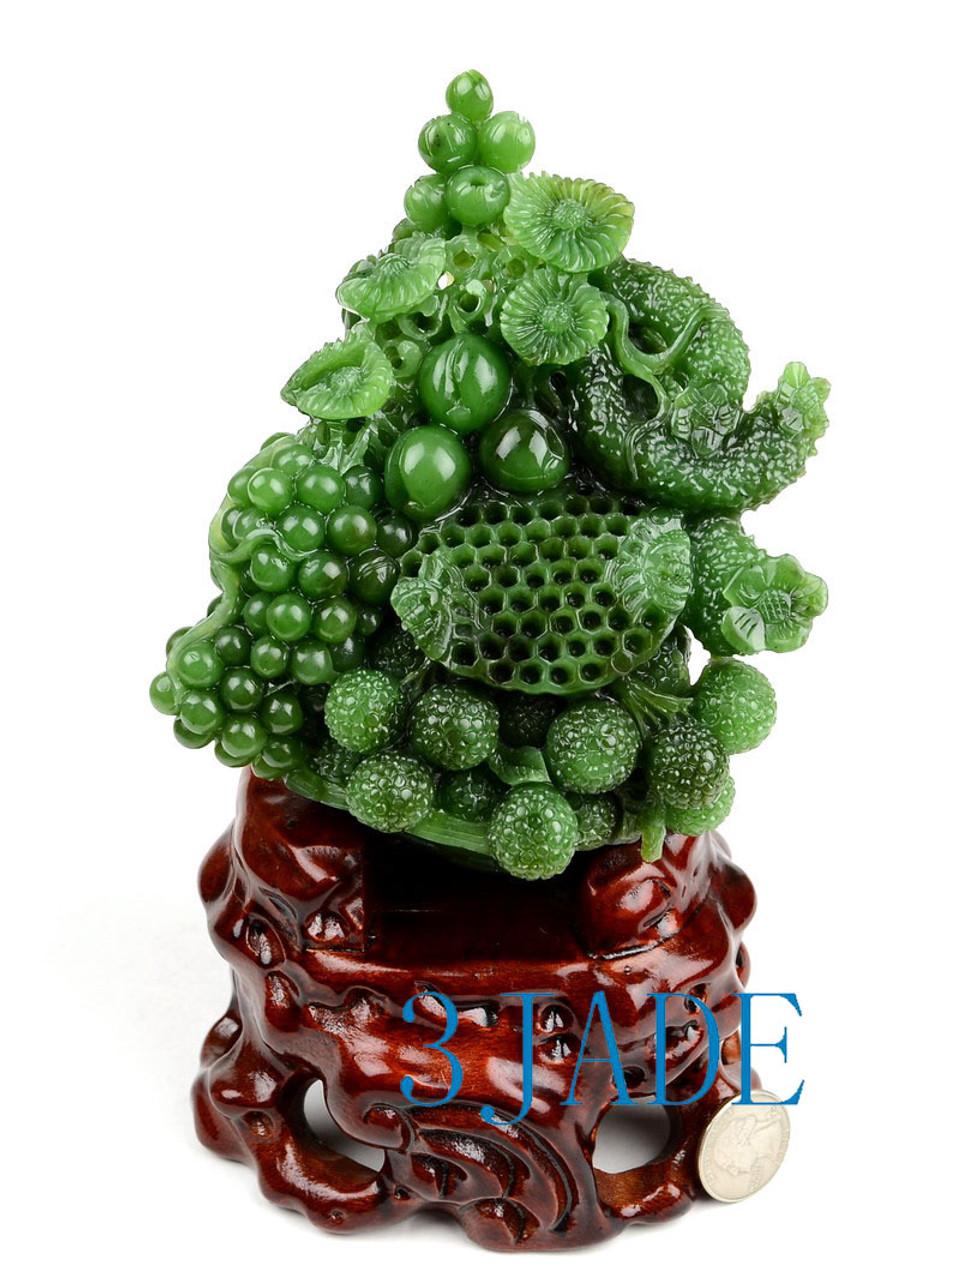 Jade Flower & Fruit Basket Statue